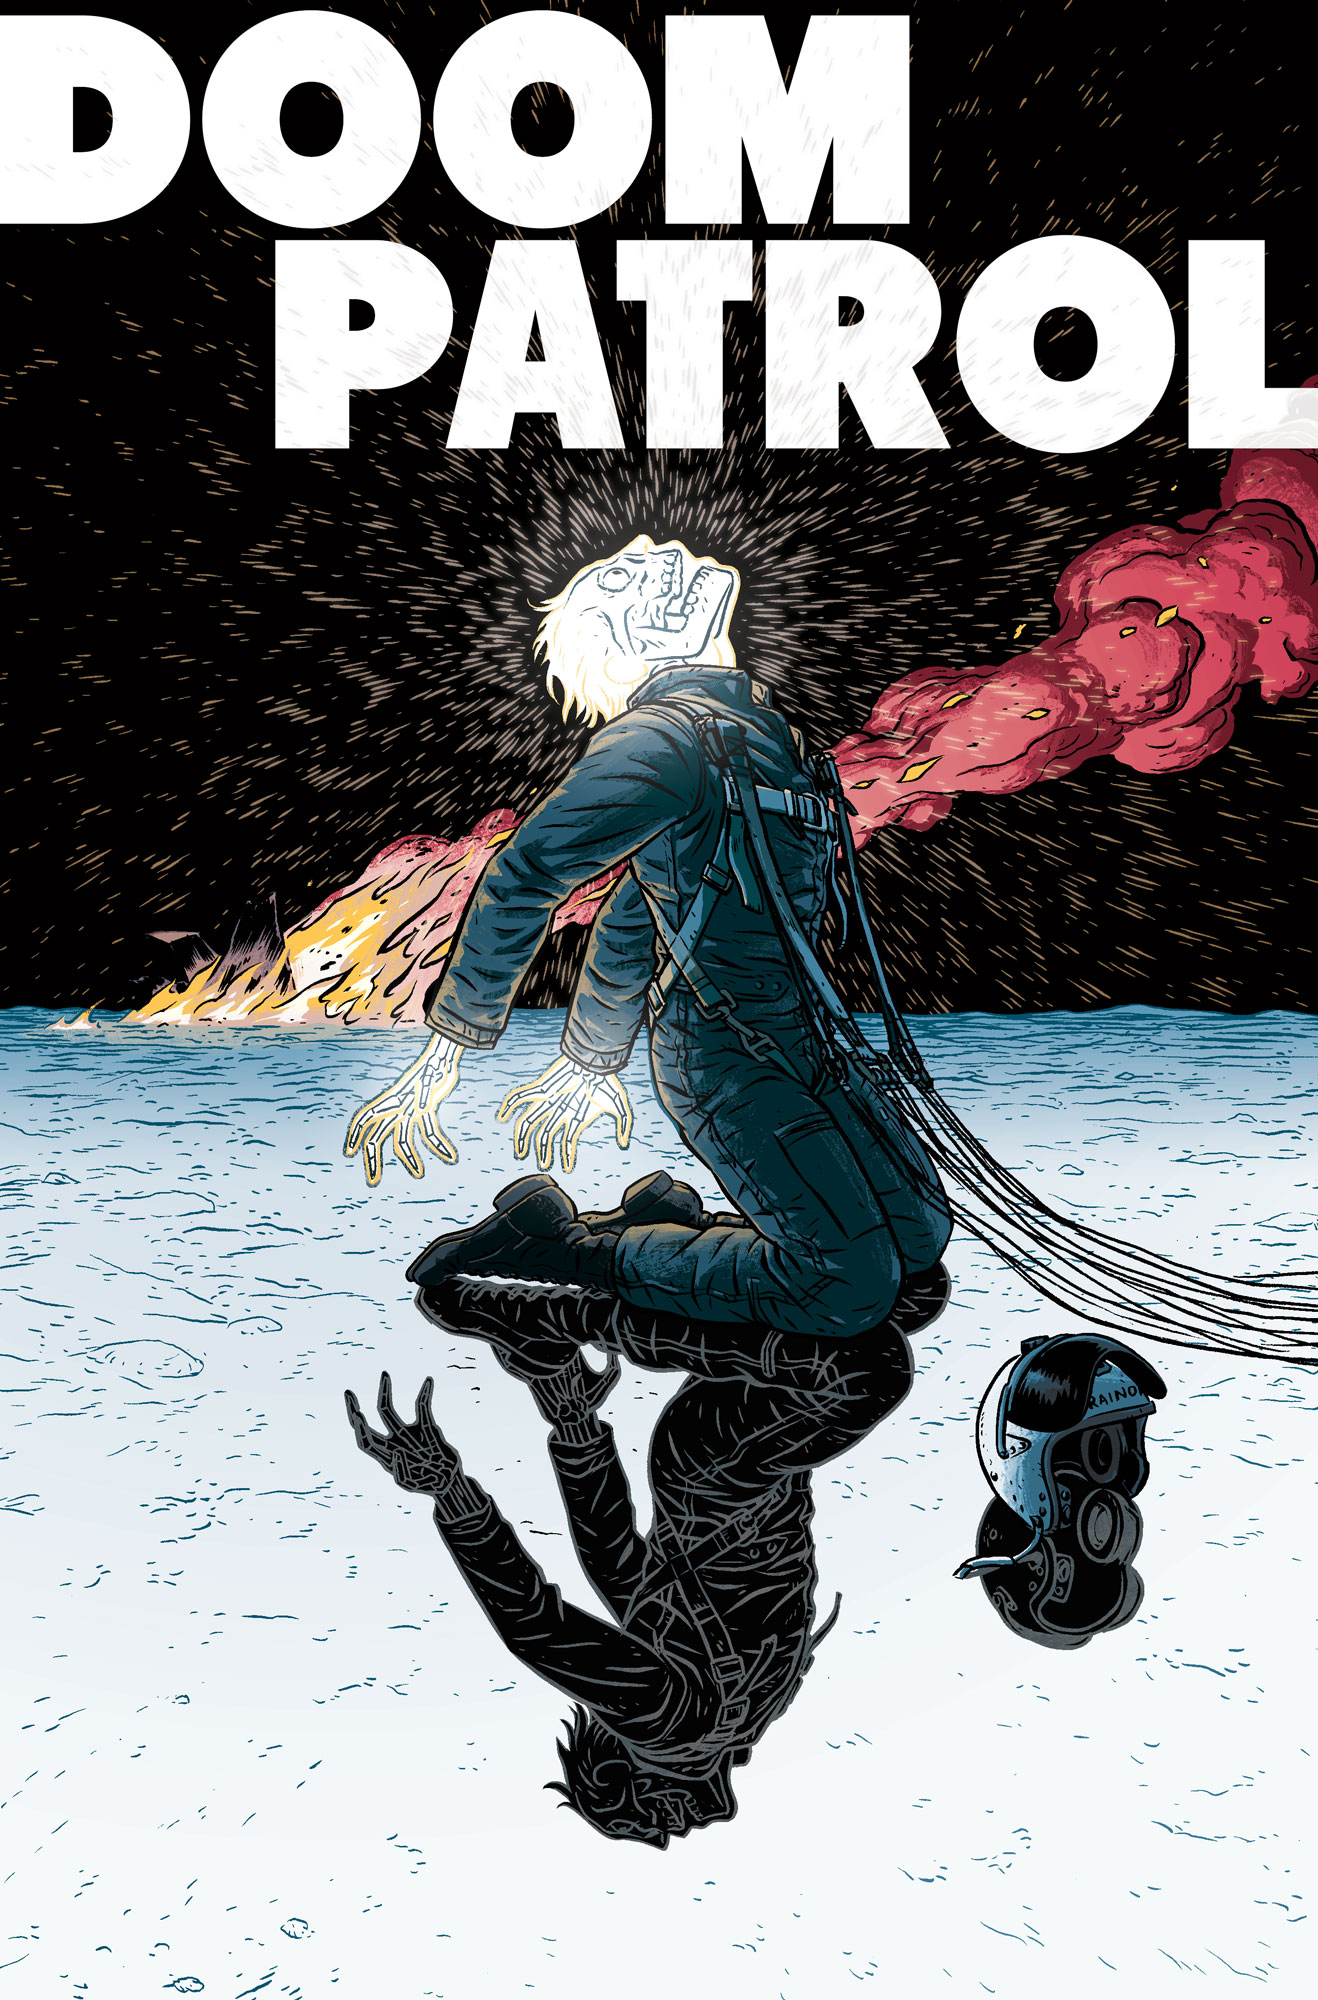 Doom Patrol - Issue 2